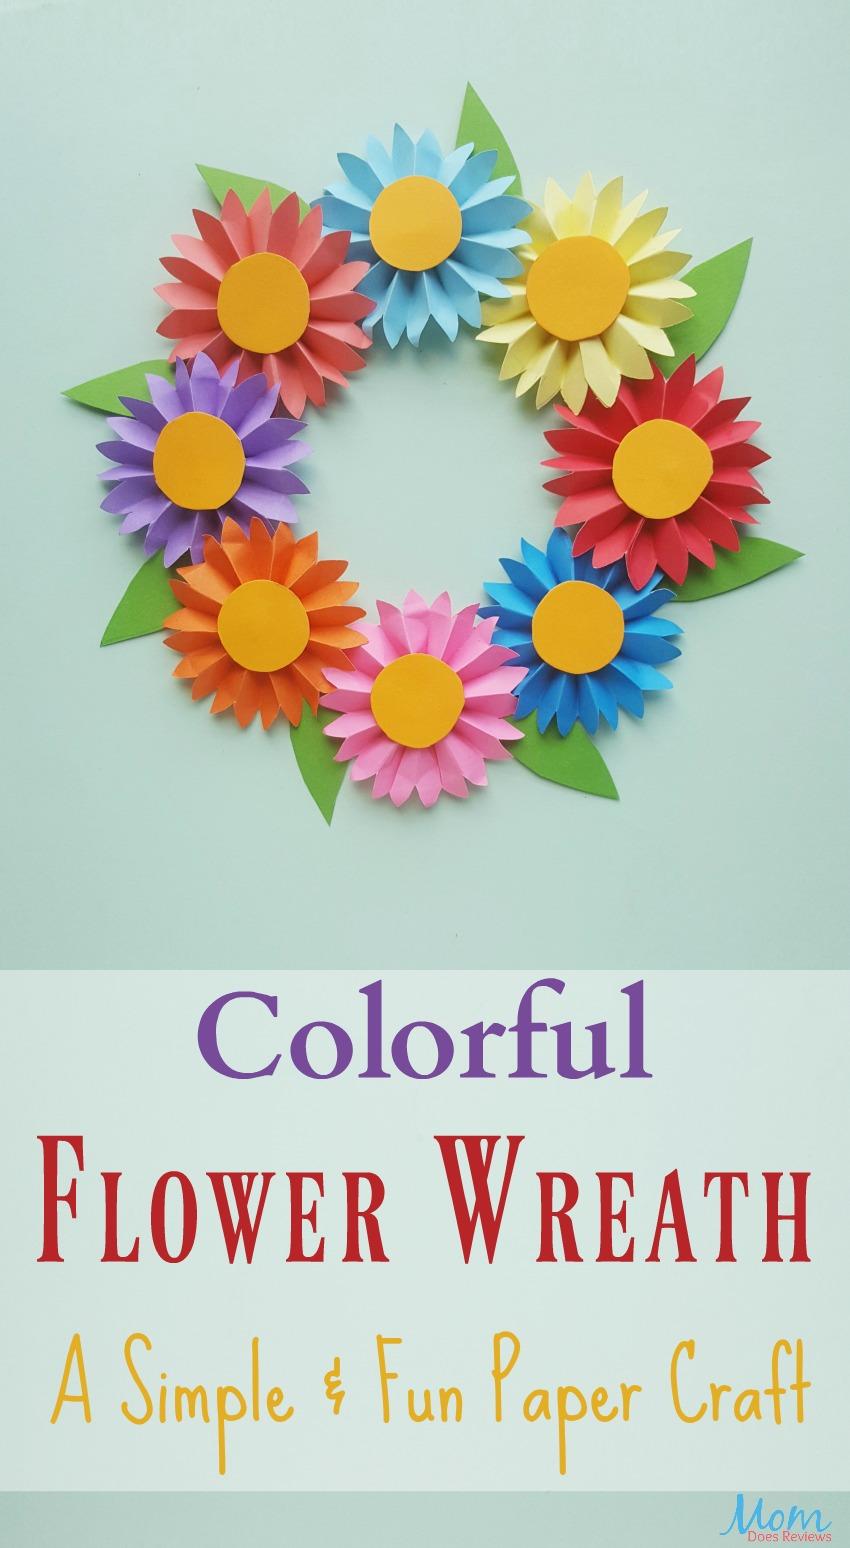 Colorful Flower Wreath, A Simple and Fun Paper #Craft #funstuff #kidscraft #flowers #diy